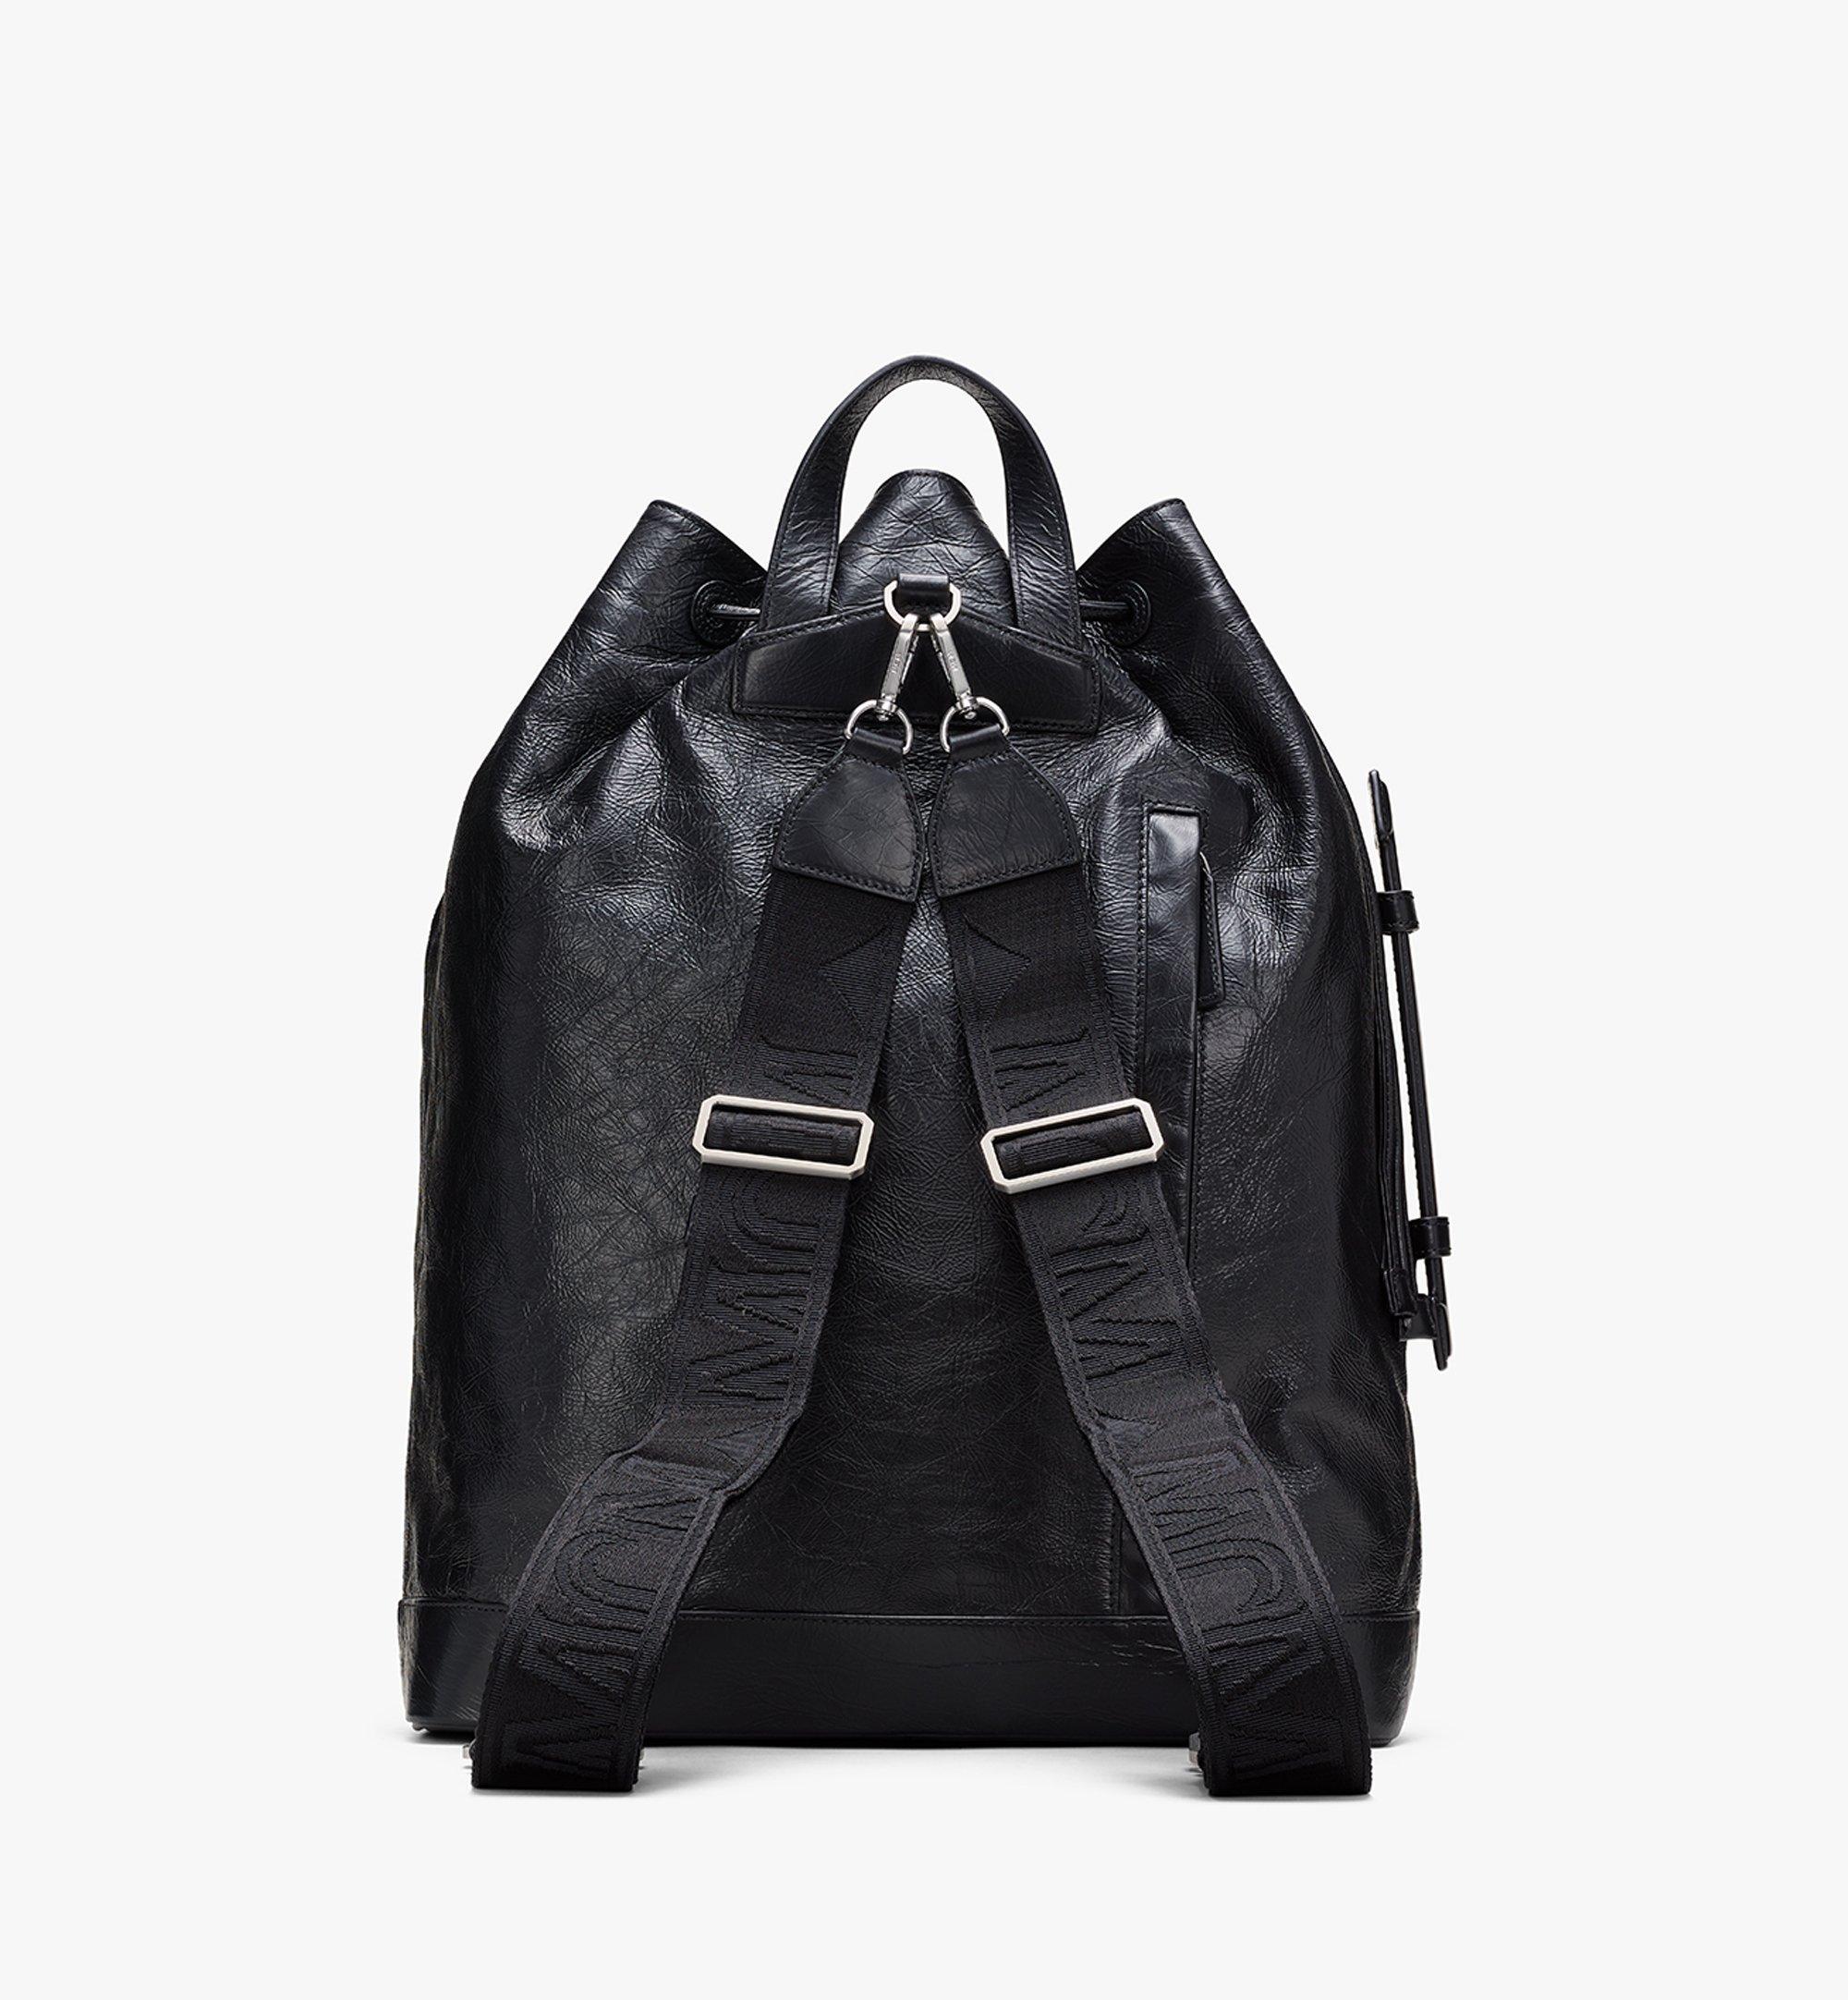 MCM Klassik Drawstring Backpack in Crushed Leather Black MMDASKC01BK001 Alternate View 3